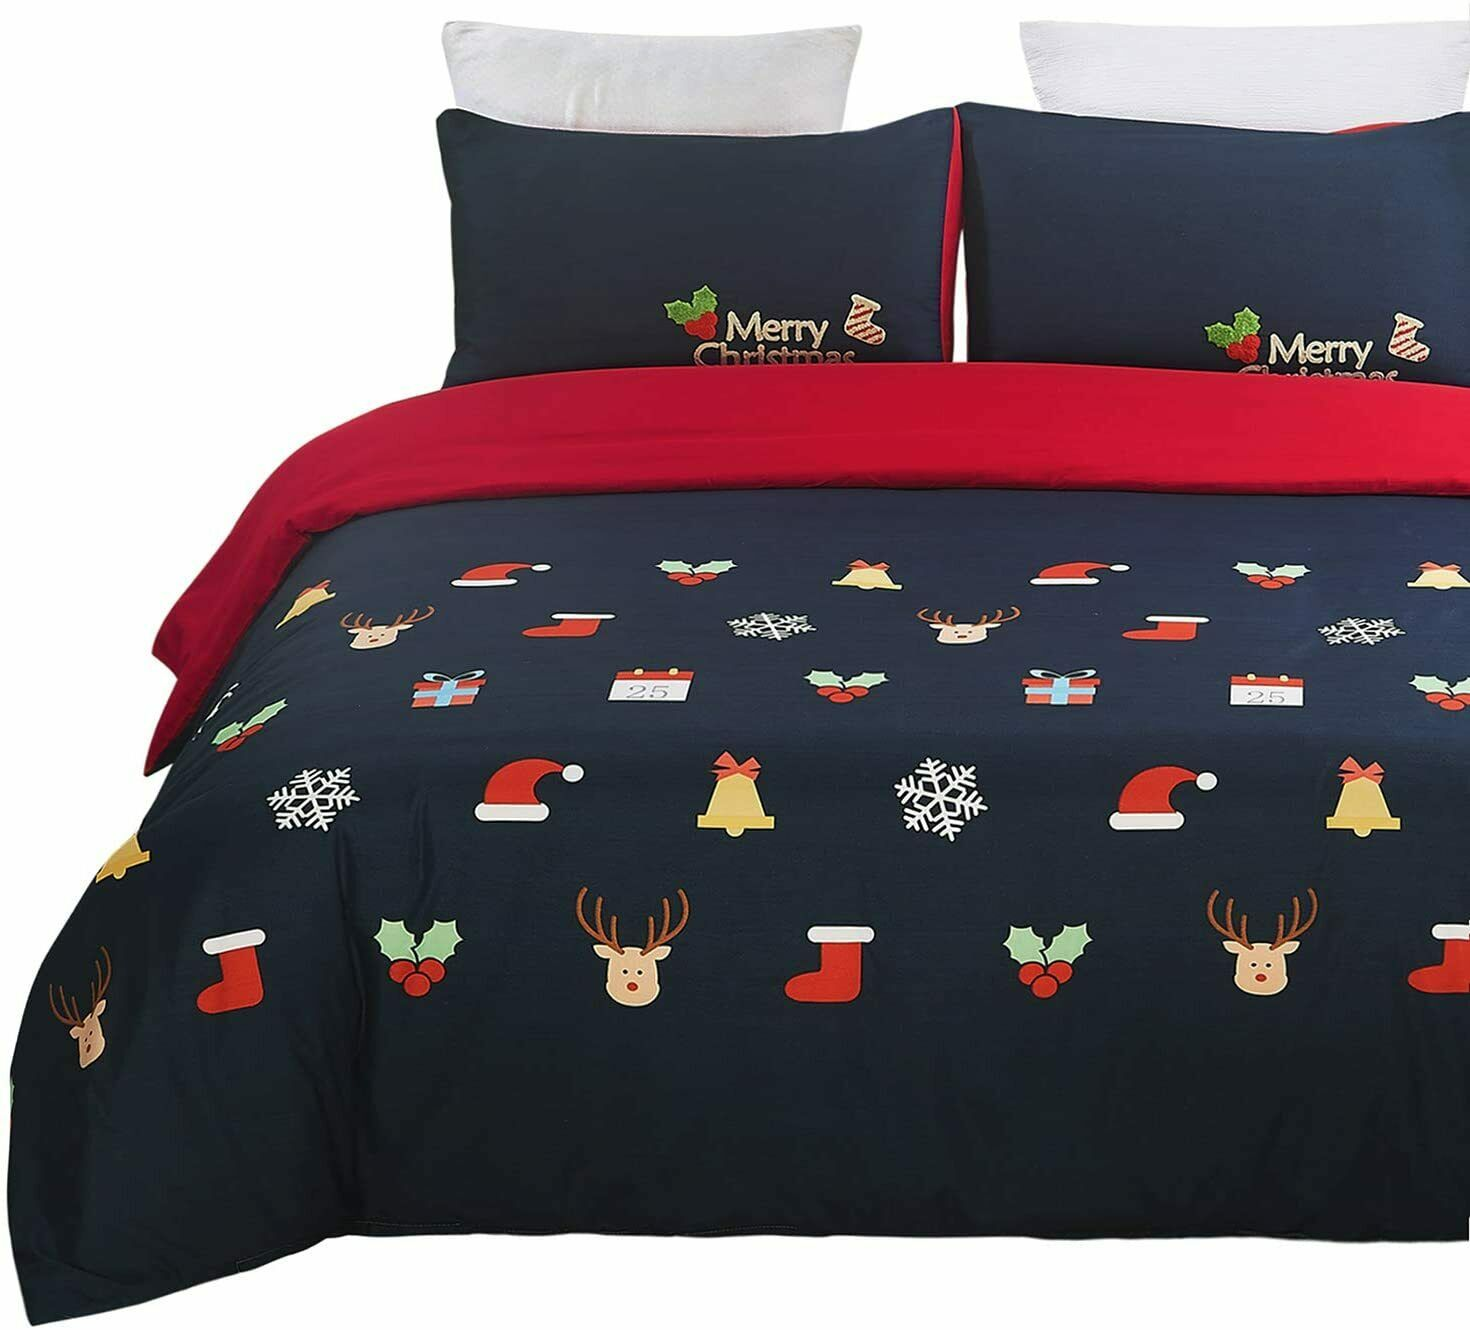 Vaulia Home Collection King Duvet Cover Set BS620K Christmas